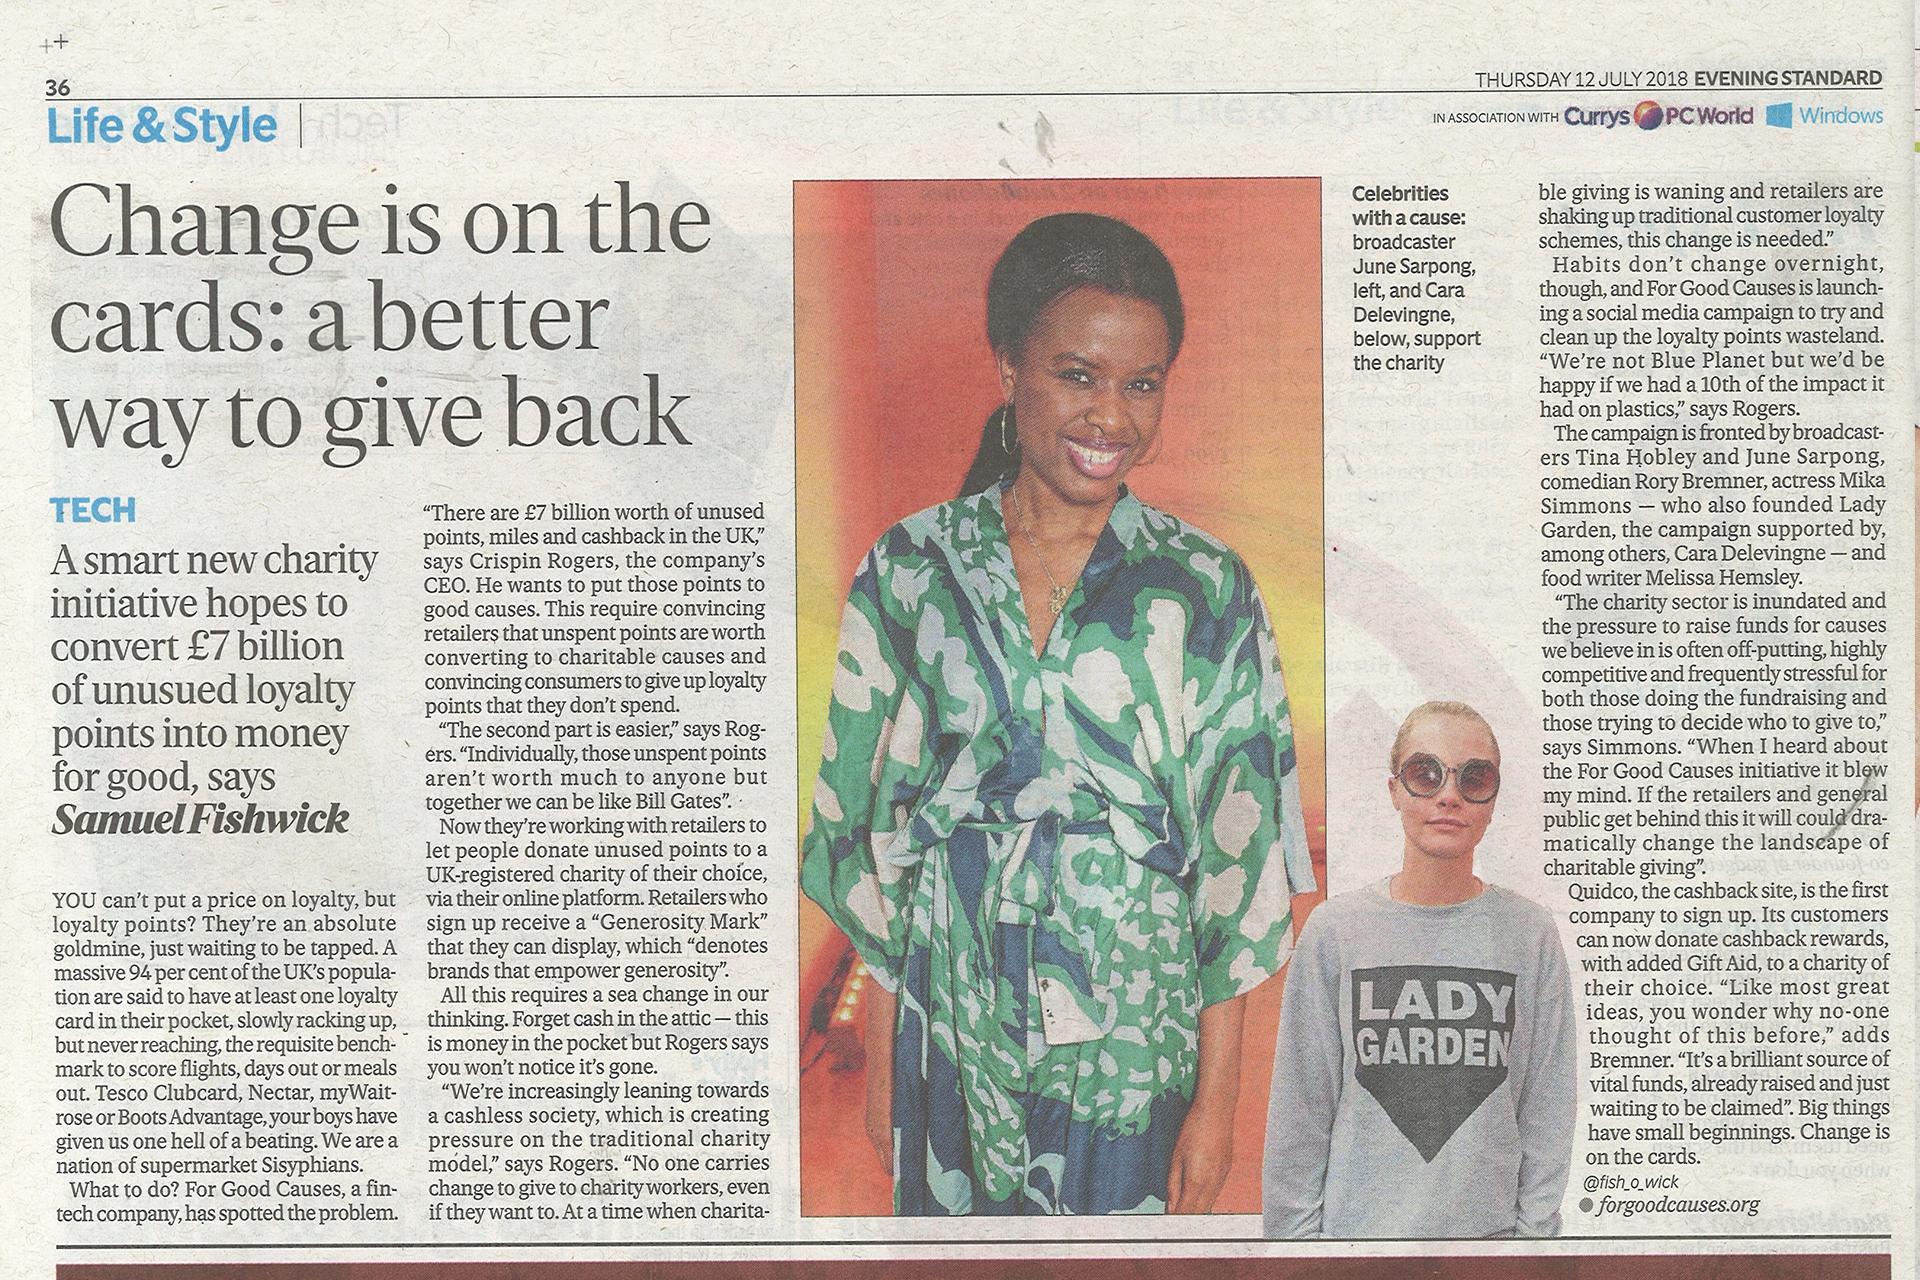 Copy of Evening Standard